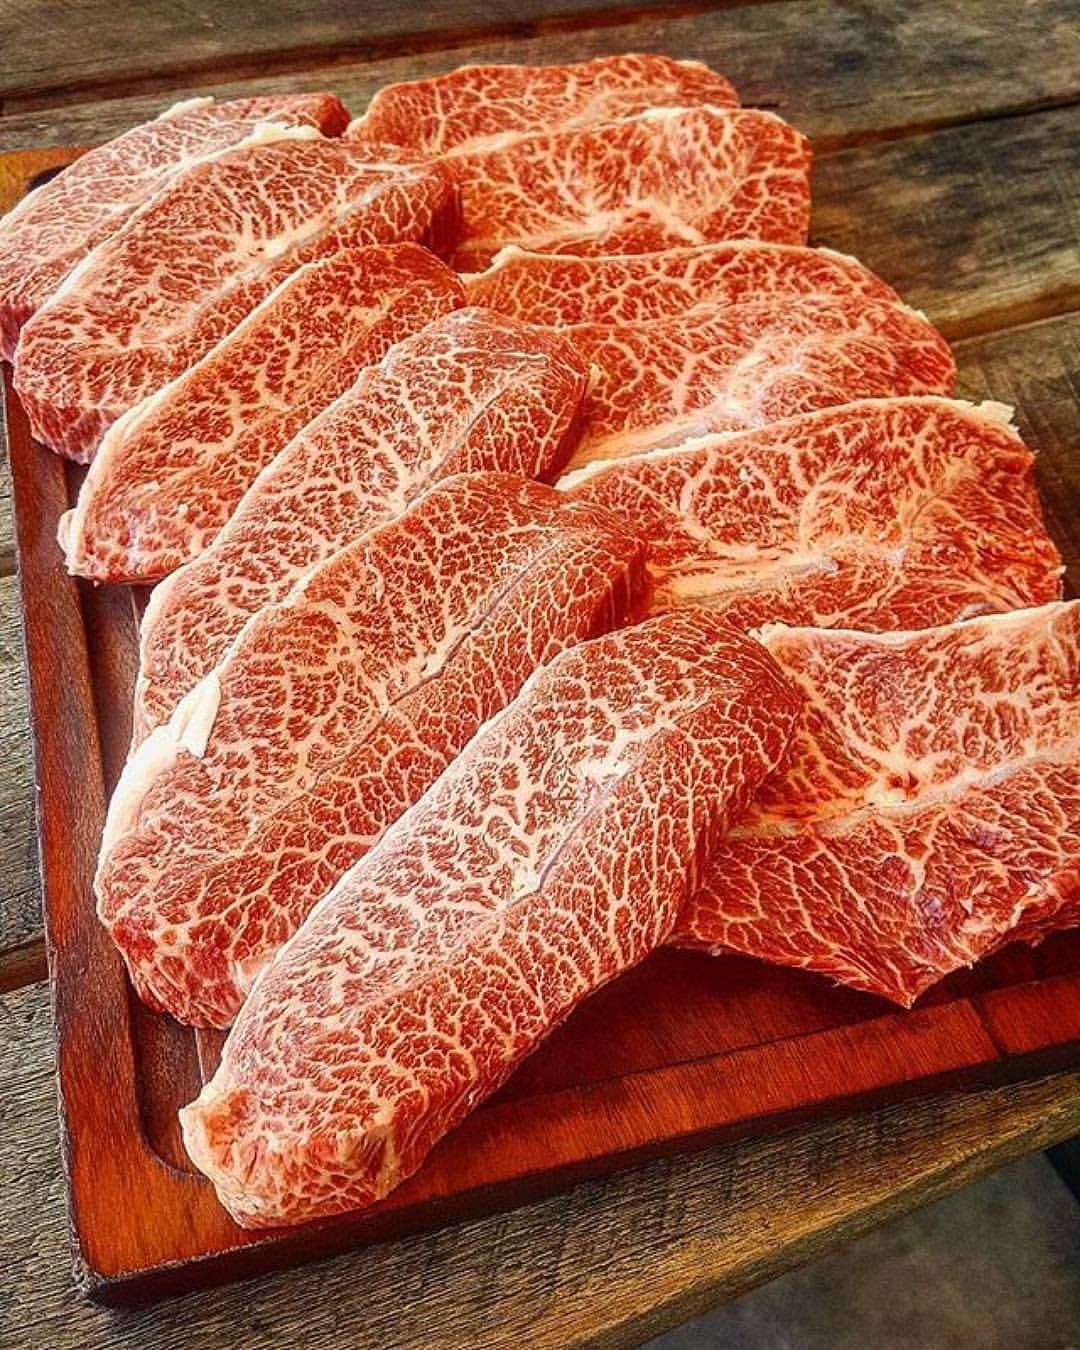 309c17849603 Flat iron steak marbling! How would you grill it  PC  vicsmeatmarket ...